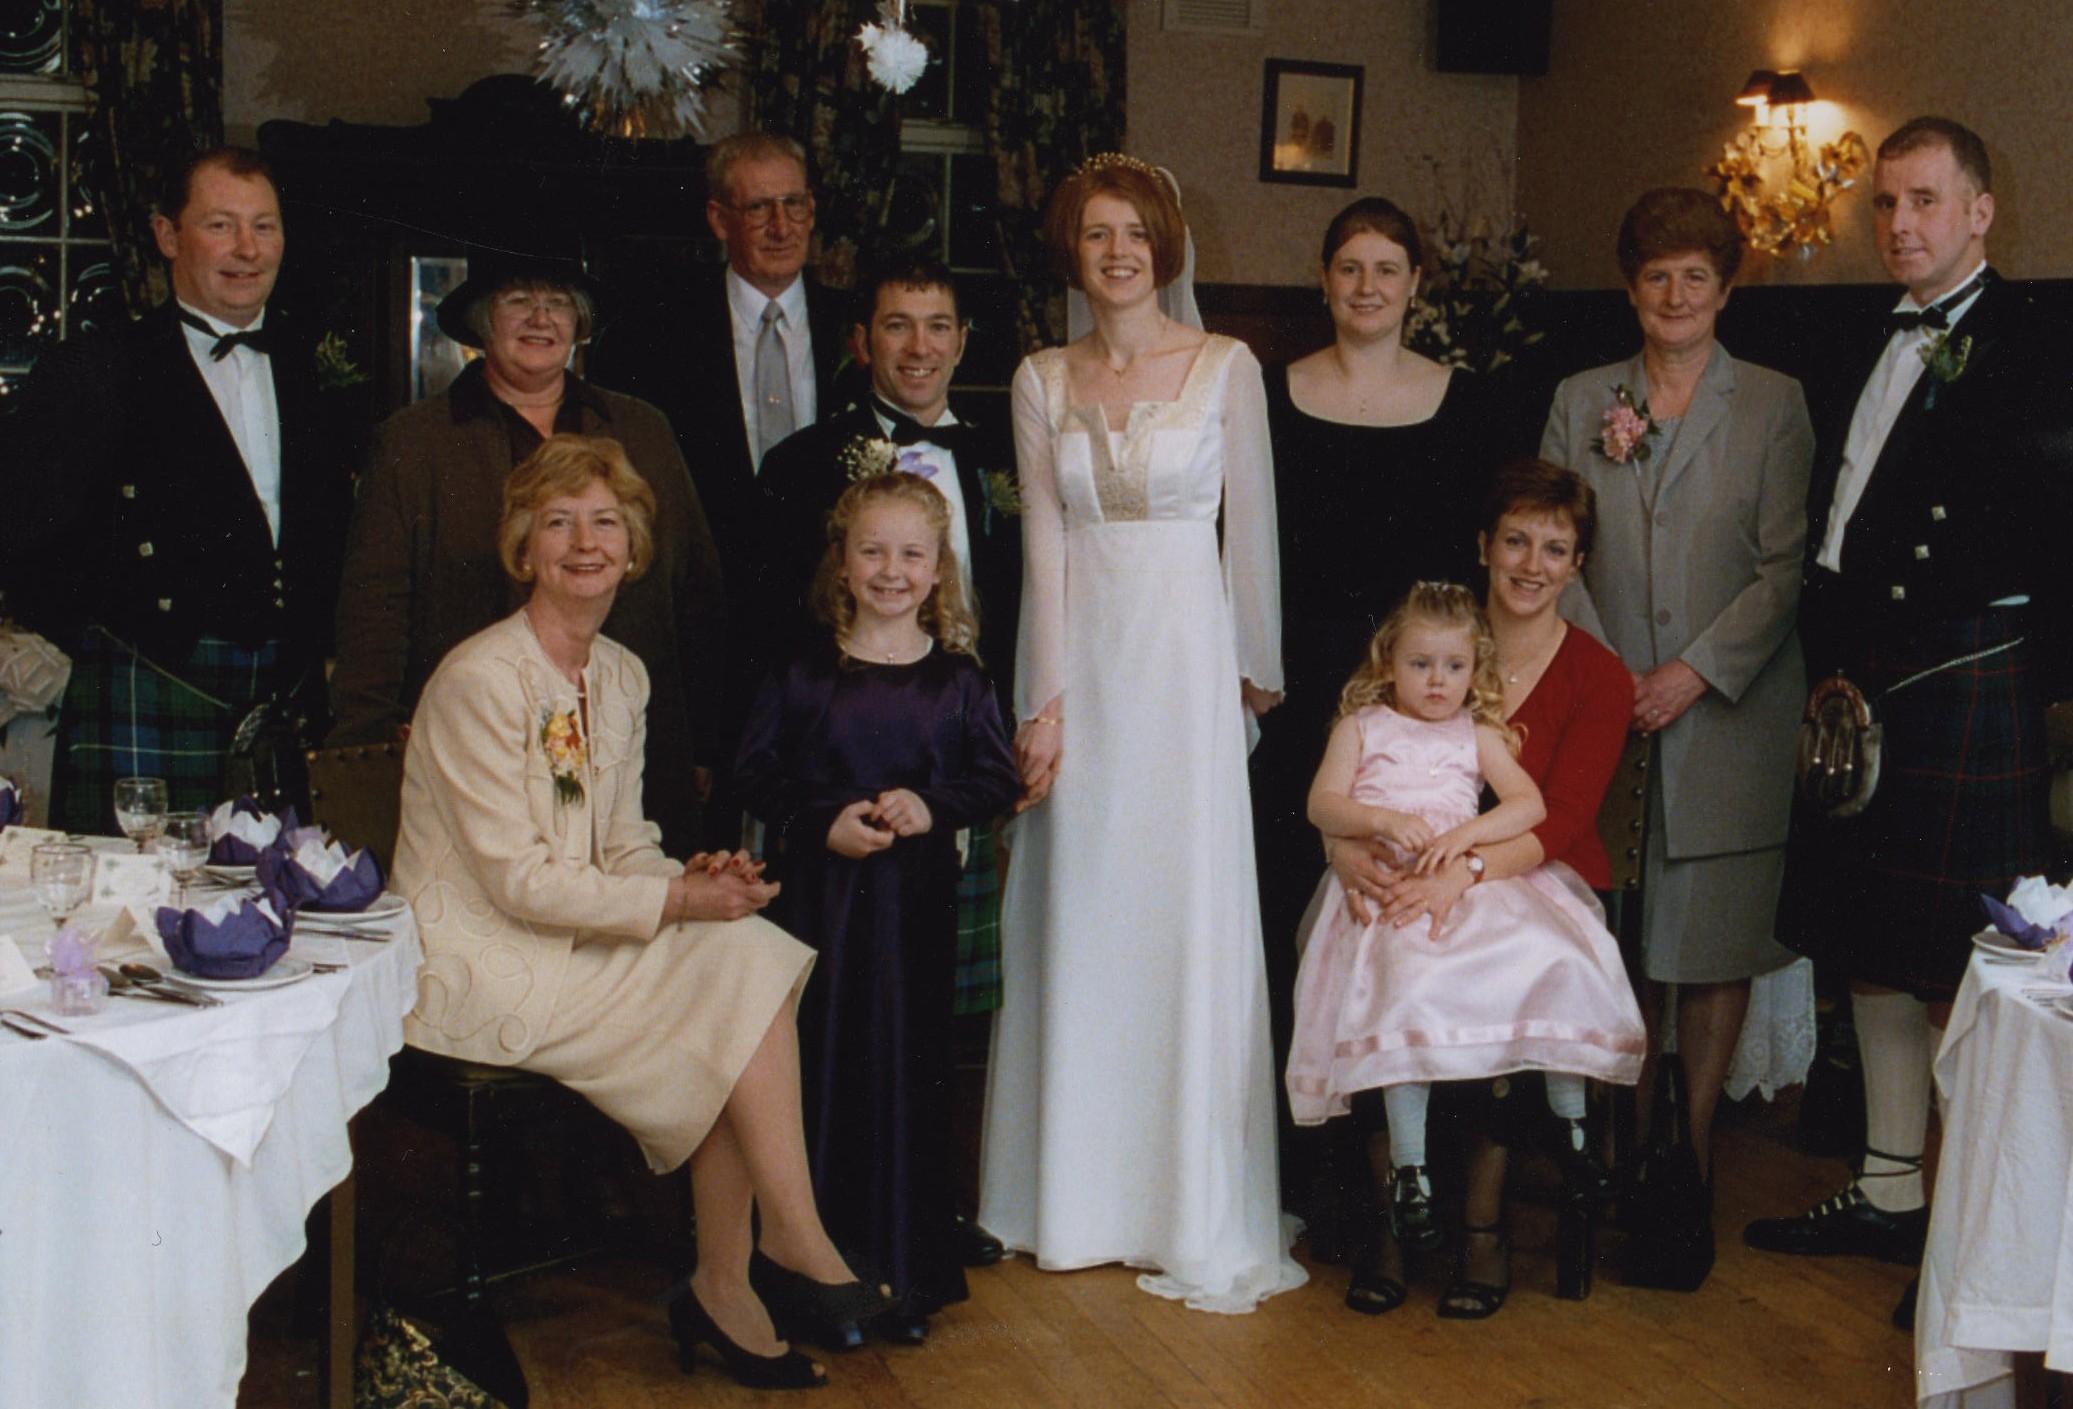 Derek Alexander & Jackie Bell's Wedding